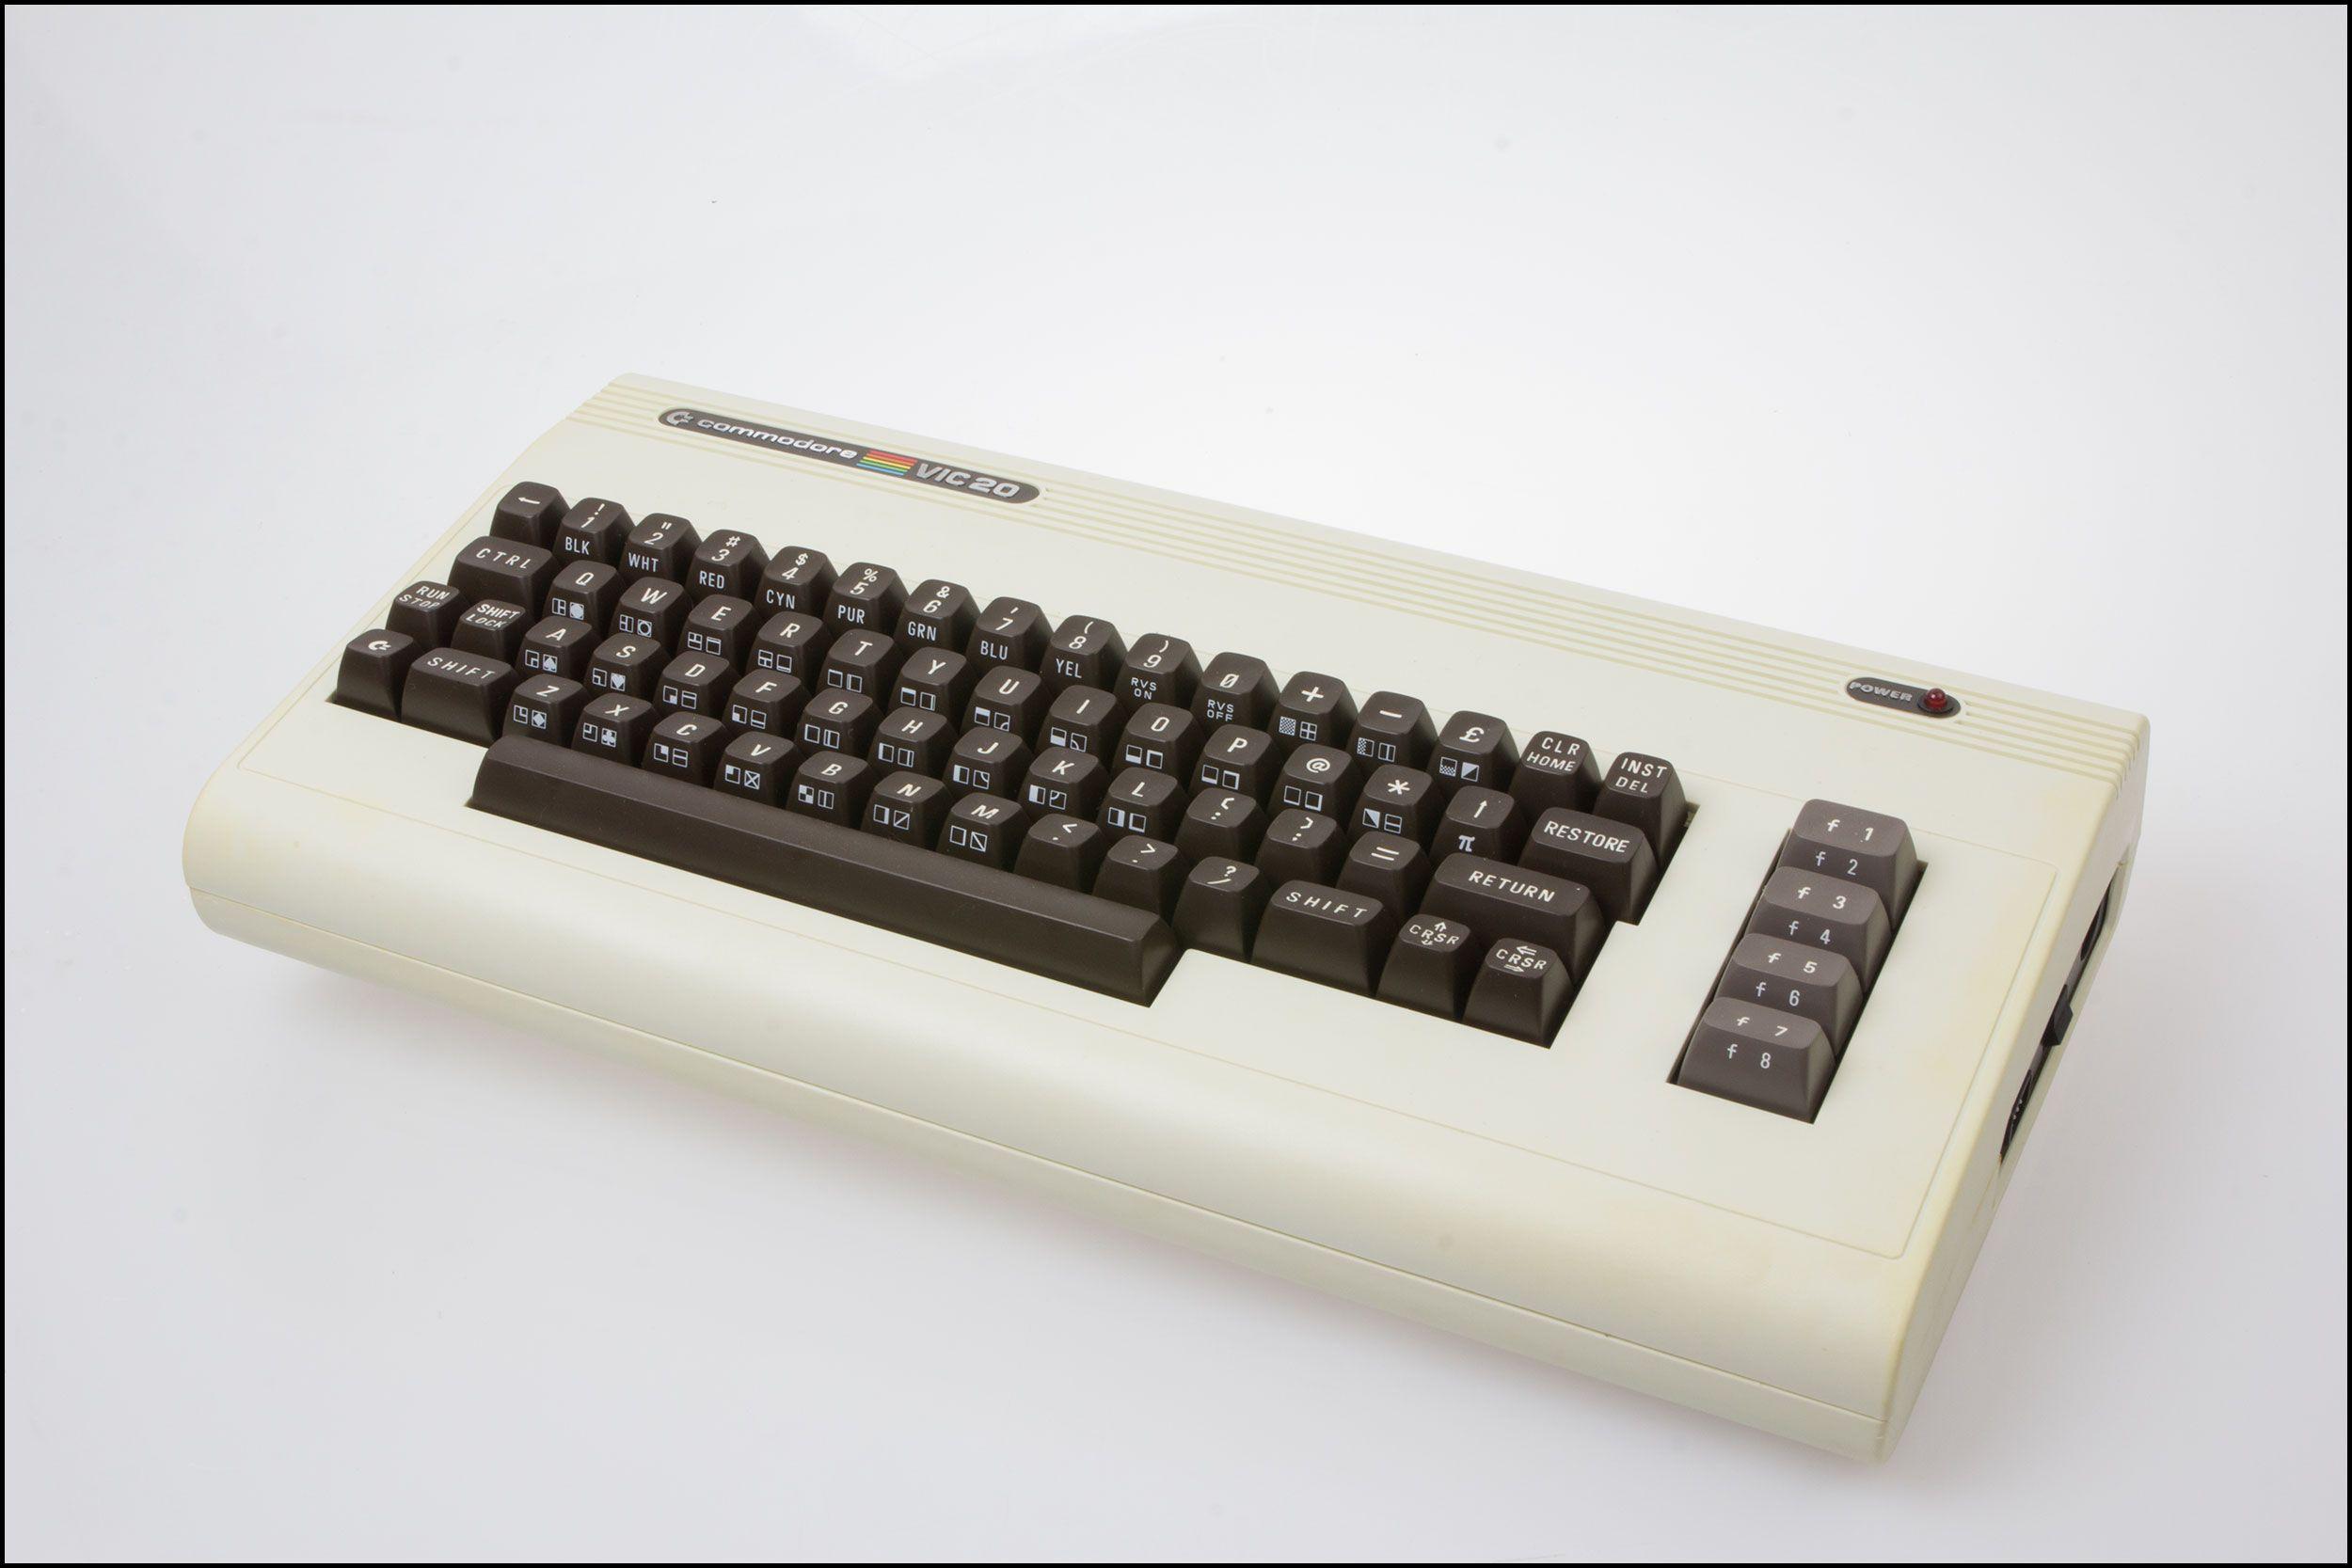 Commodore VIC 20 i all sin prakt.Foto: Jørgen Elton Nilsen, Hardware.no